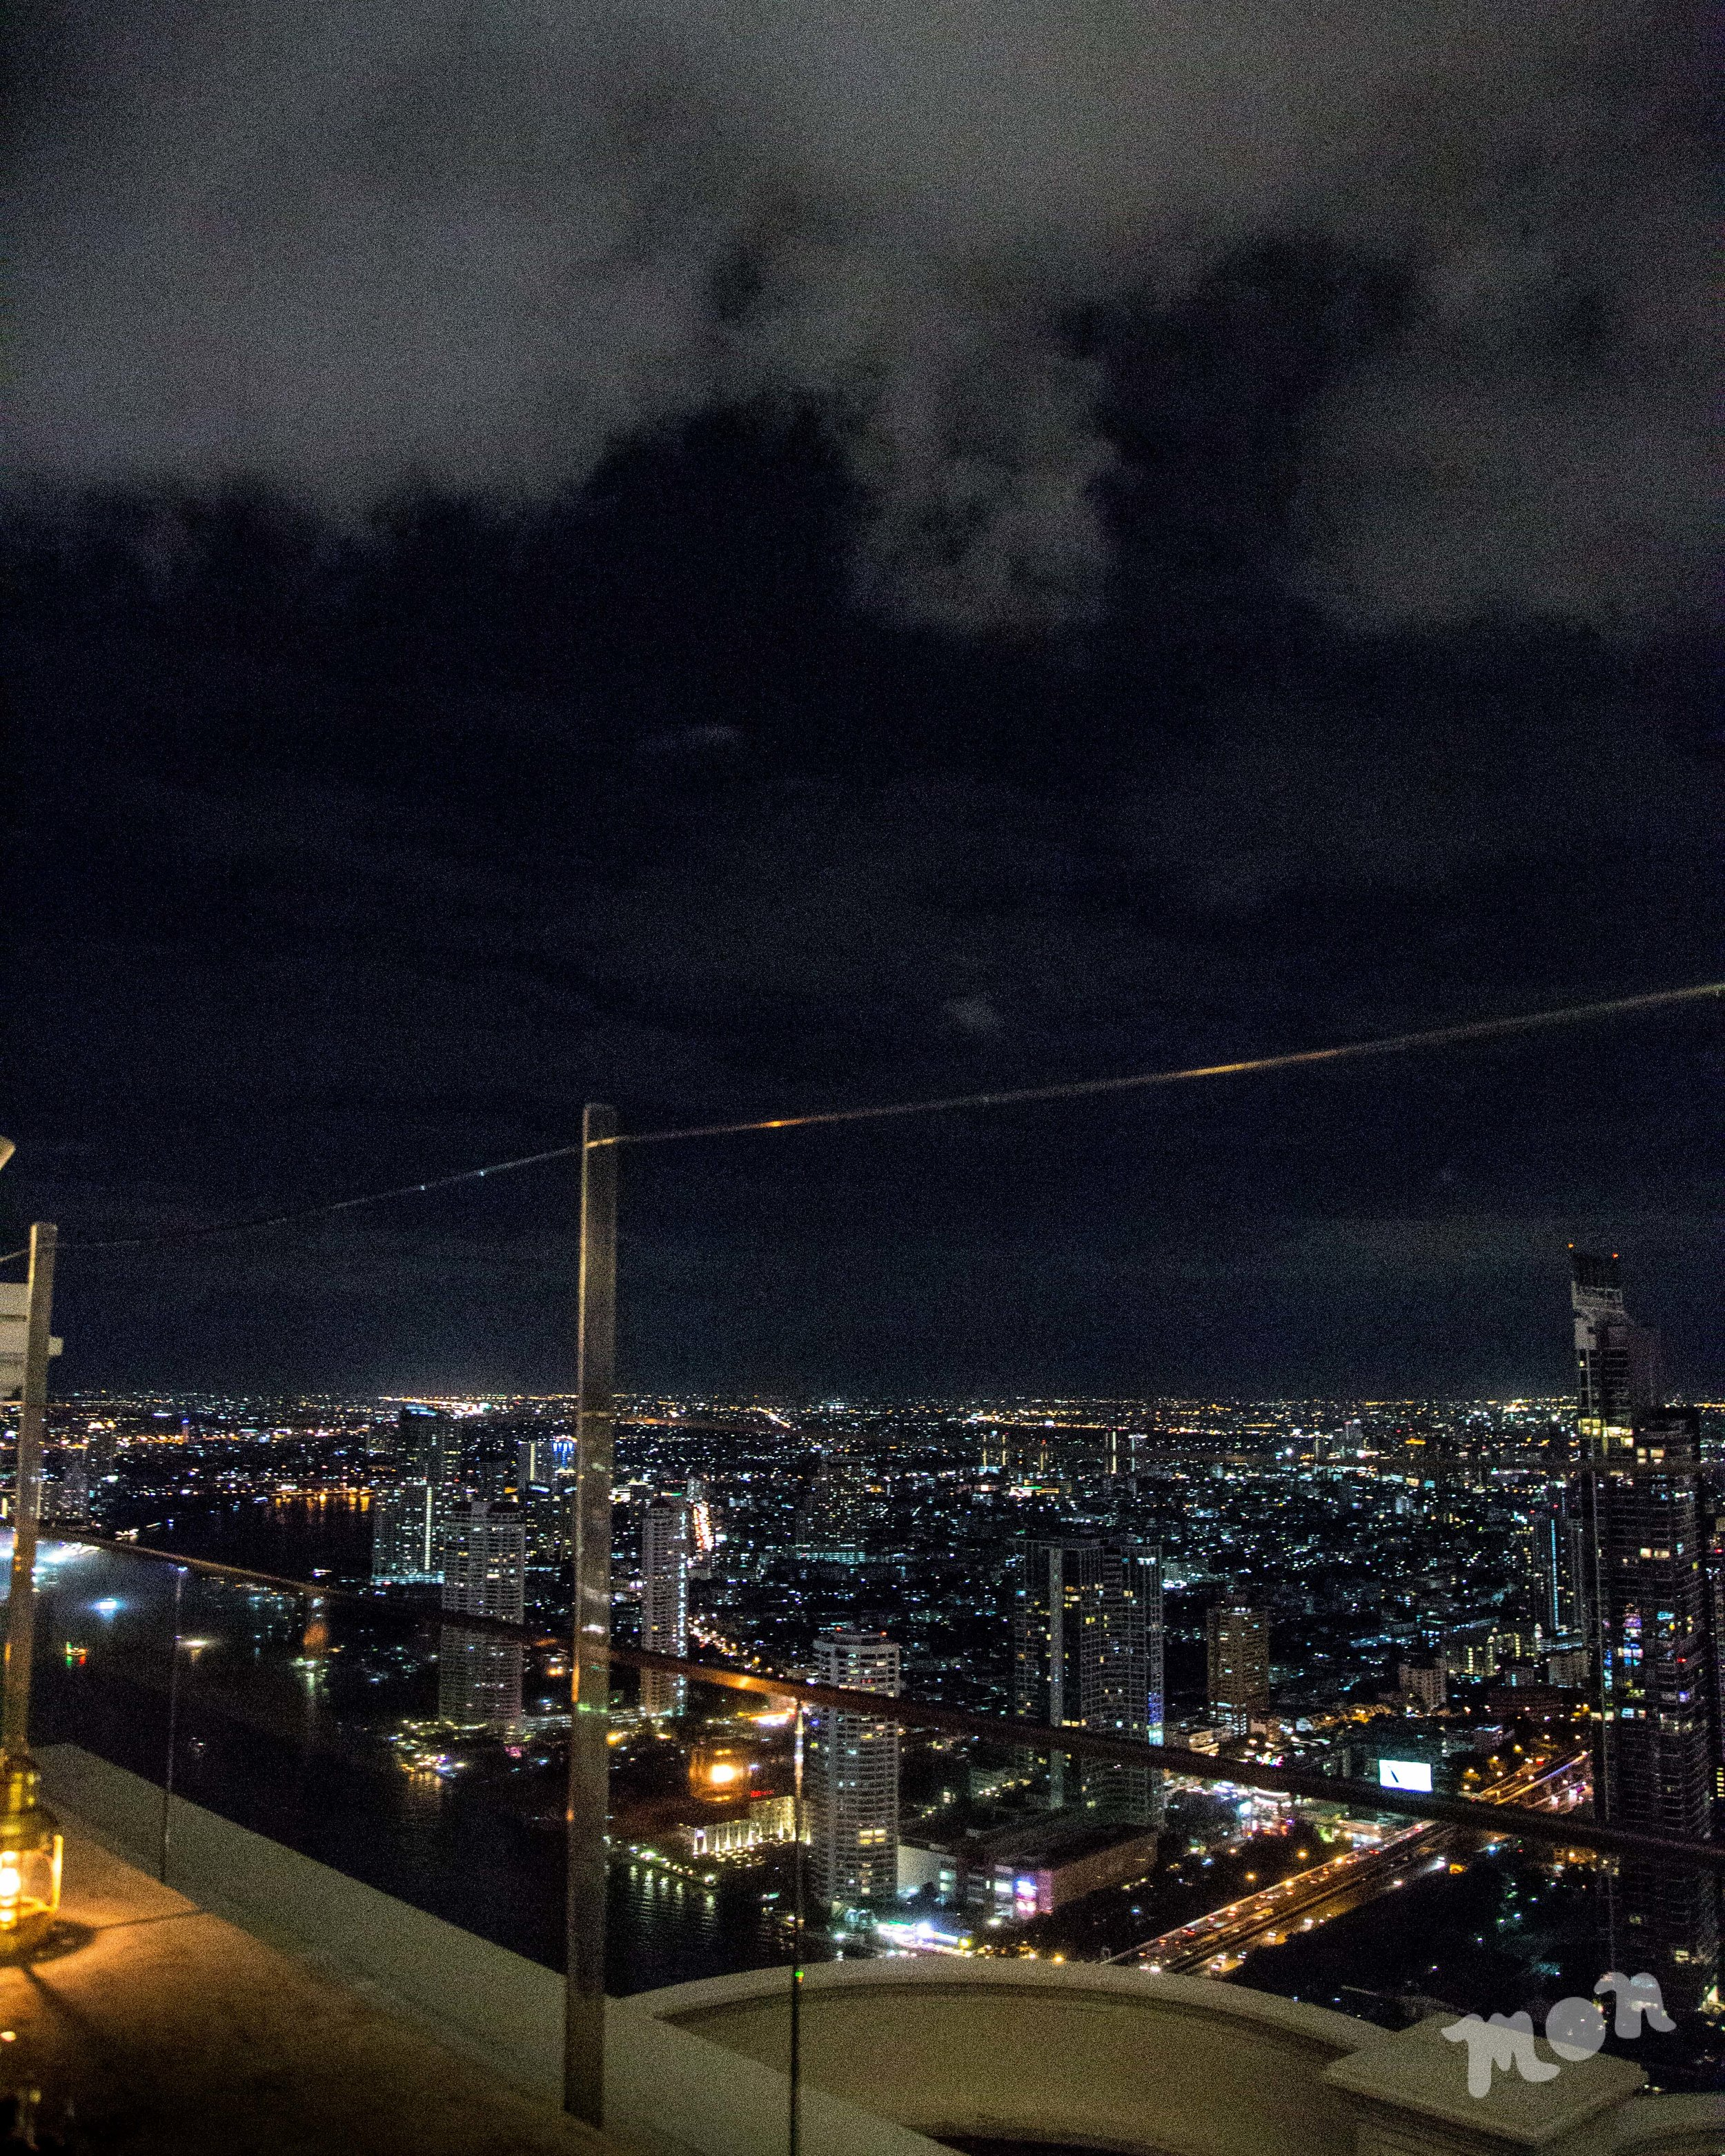 Skybar Rooftop Bar